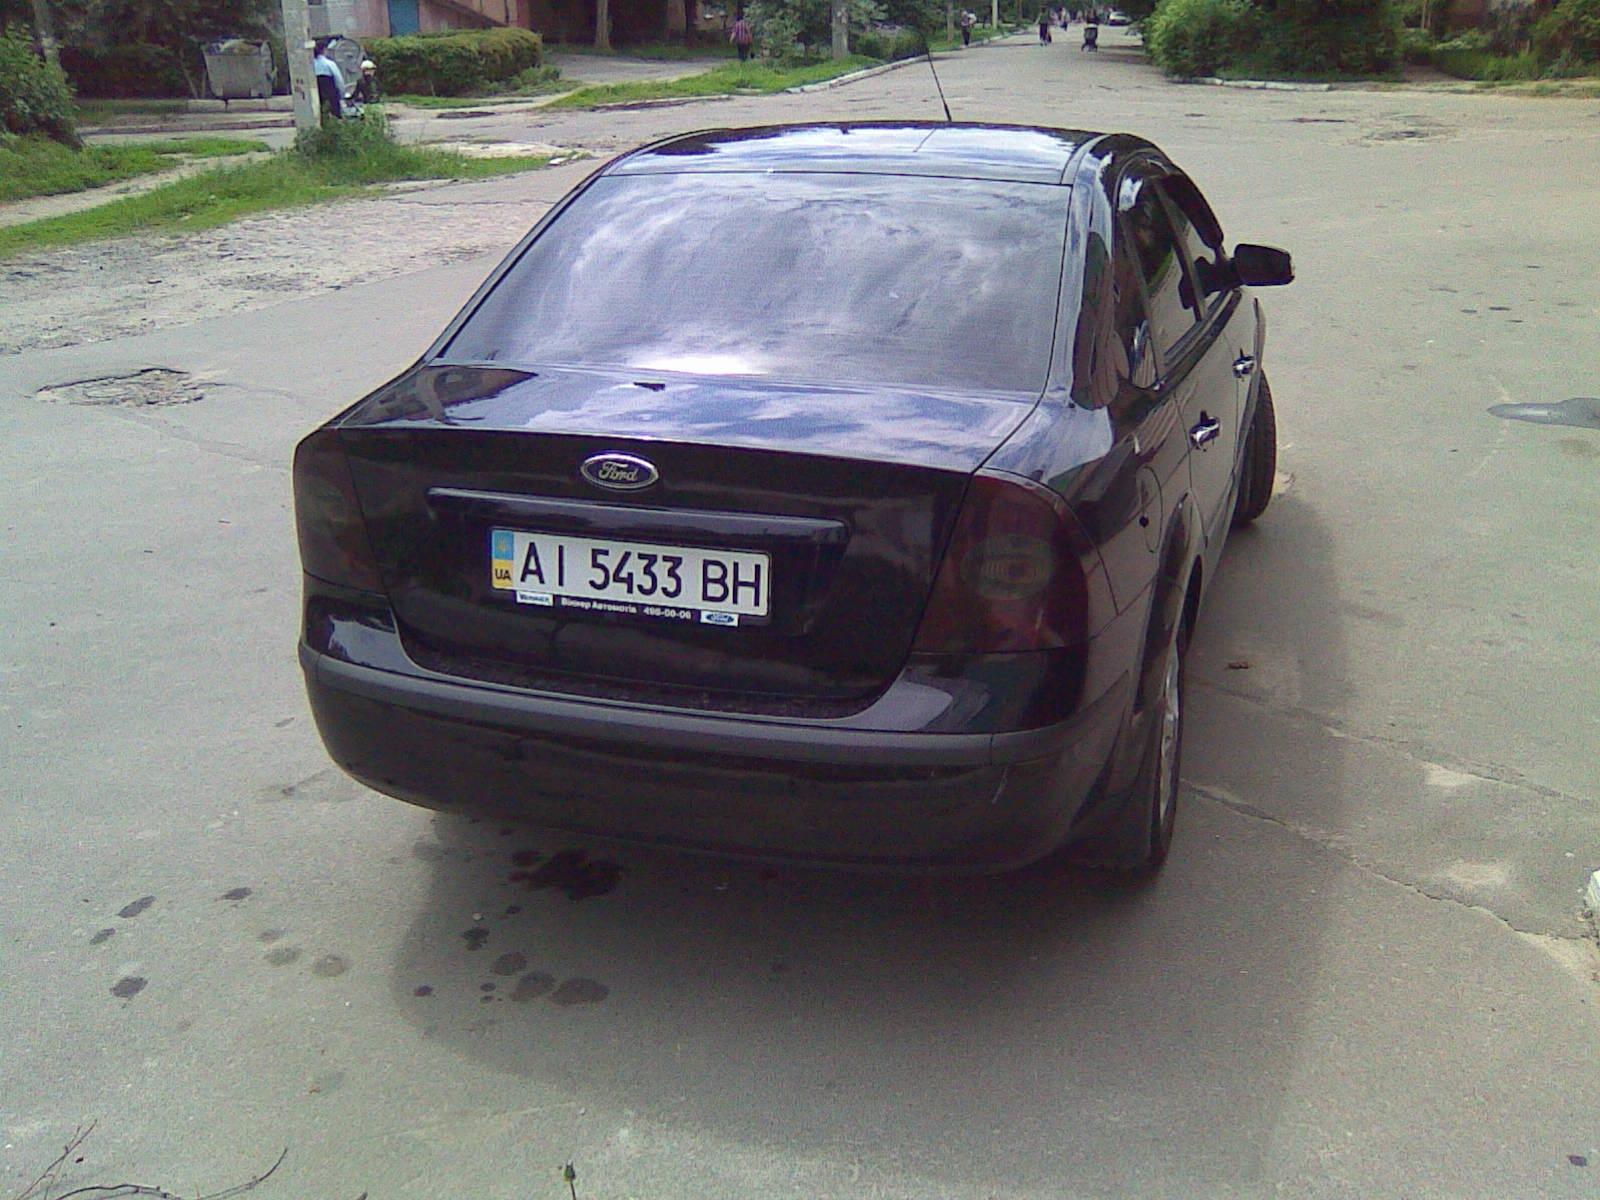 тонировка задних фонарей - бортжурнал Ford Focus Sedan 2.0 GHIA чисто чёрный 2007 года на DRIVE2